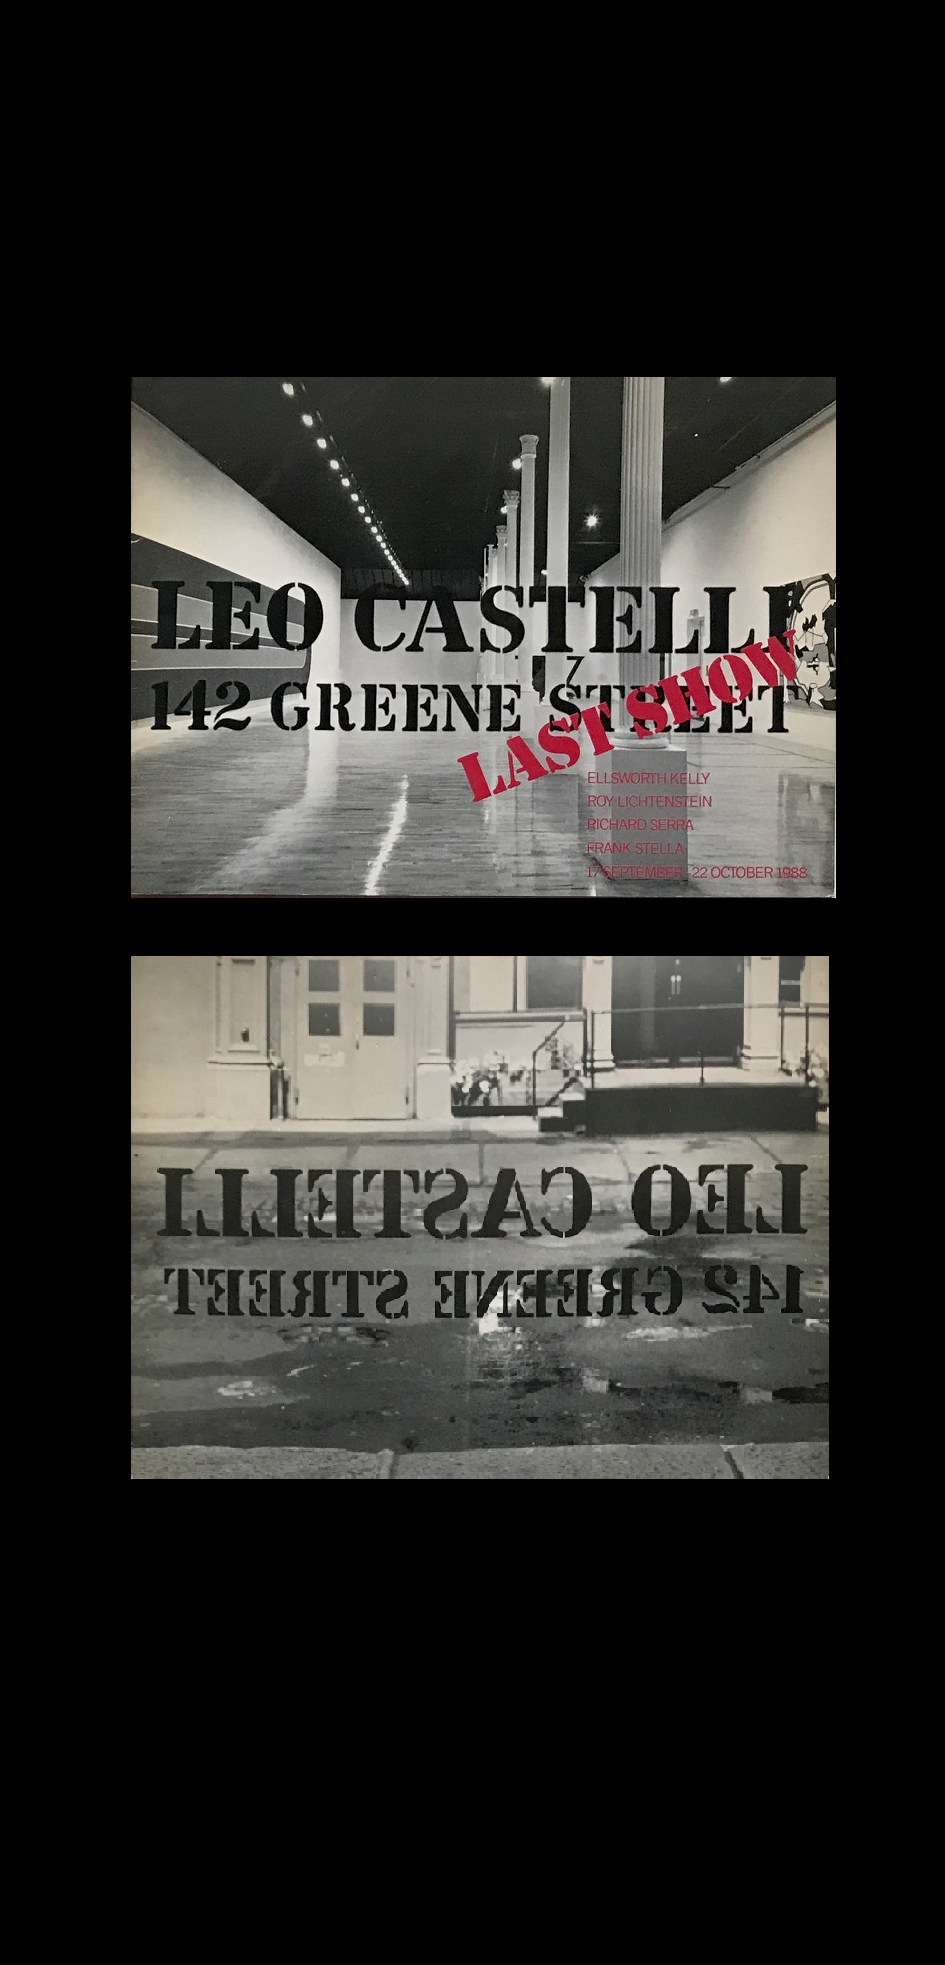 """LEO CASTELLI- LAST SHOW, 142 Greene Street"" , Exhibit Catalogue."